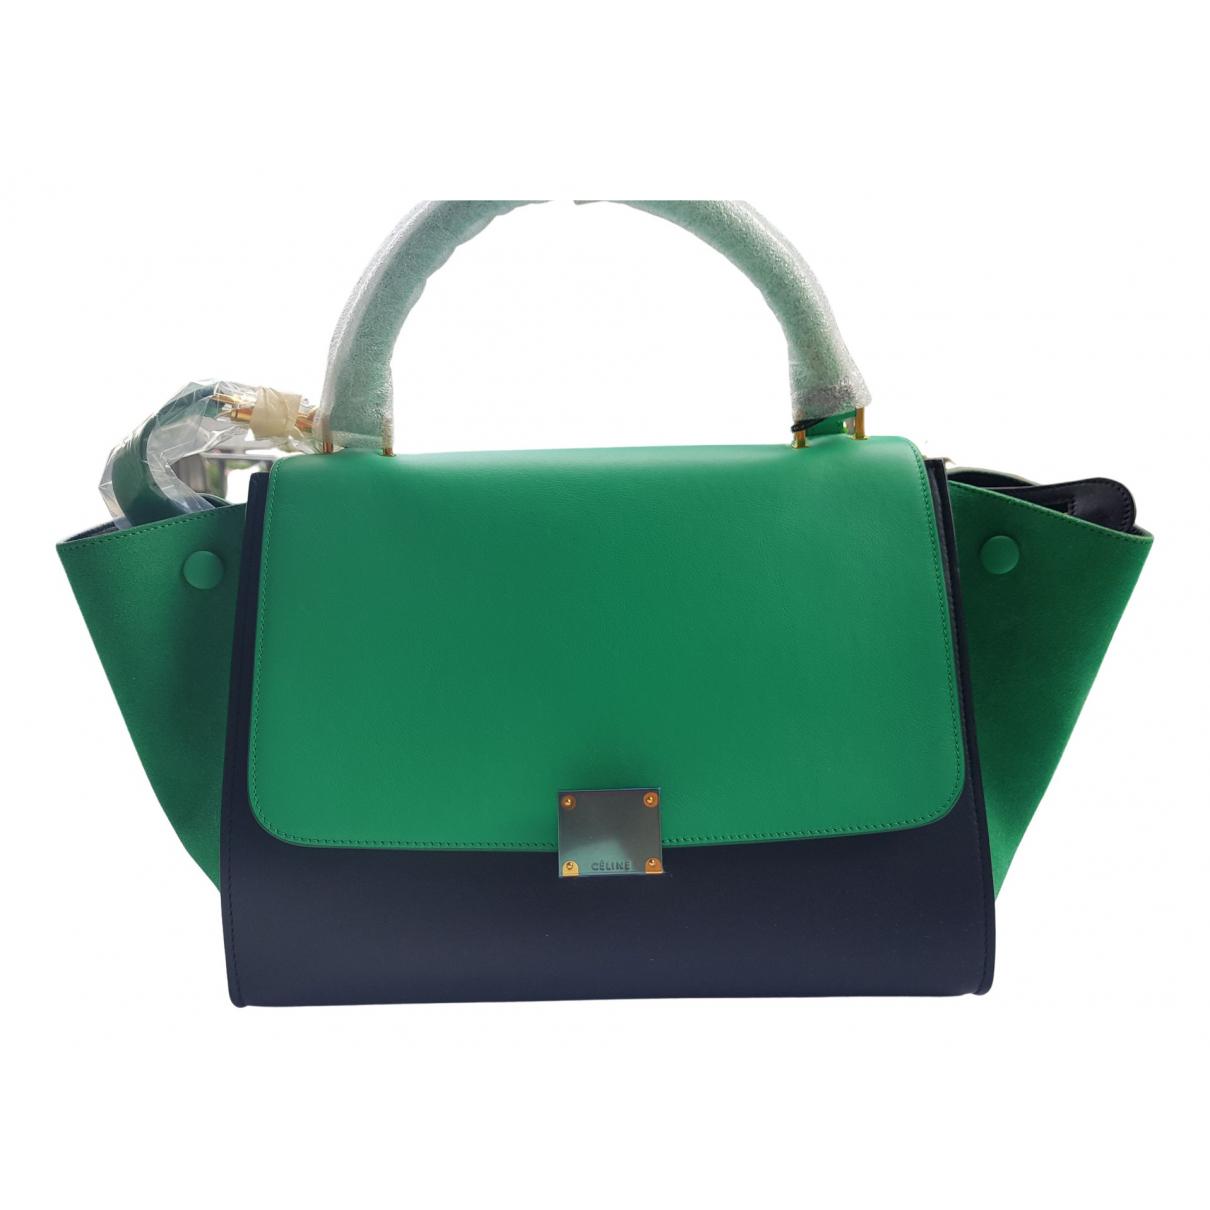 Celine Trapeze Handtasche in  Gruen Leder